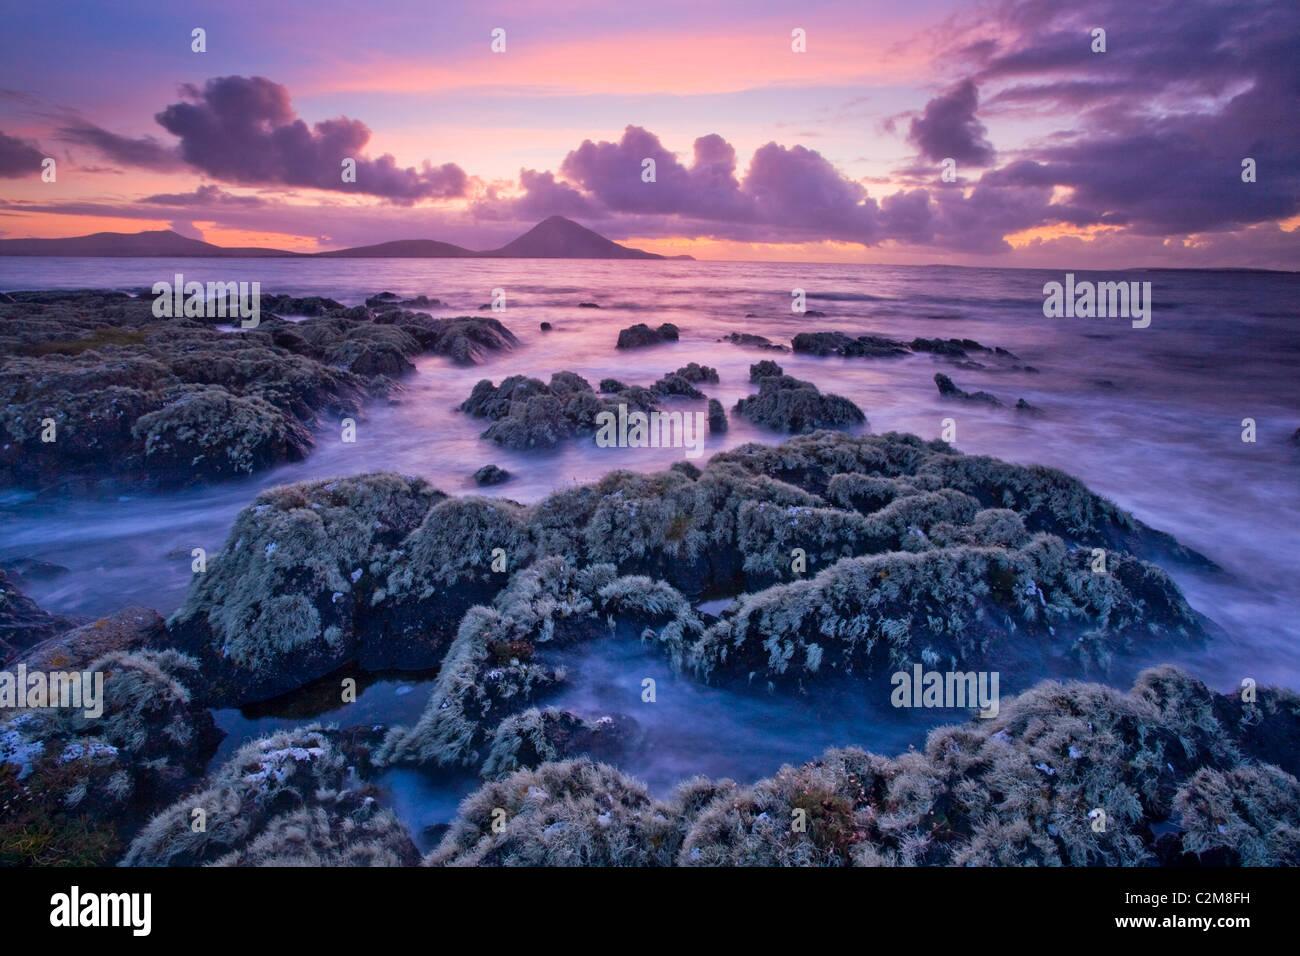 Lichen-covered shoreline at sunset, Ballycroy, County Mayo, Ireland. - Stock Image